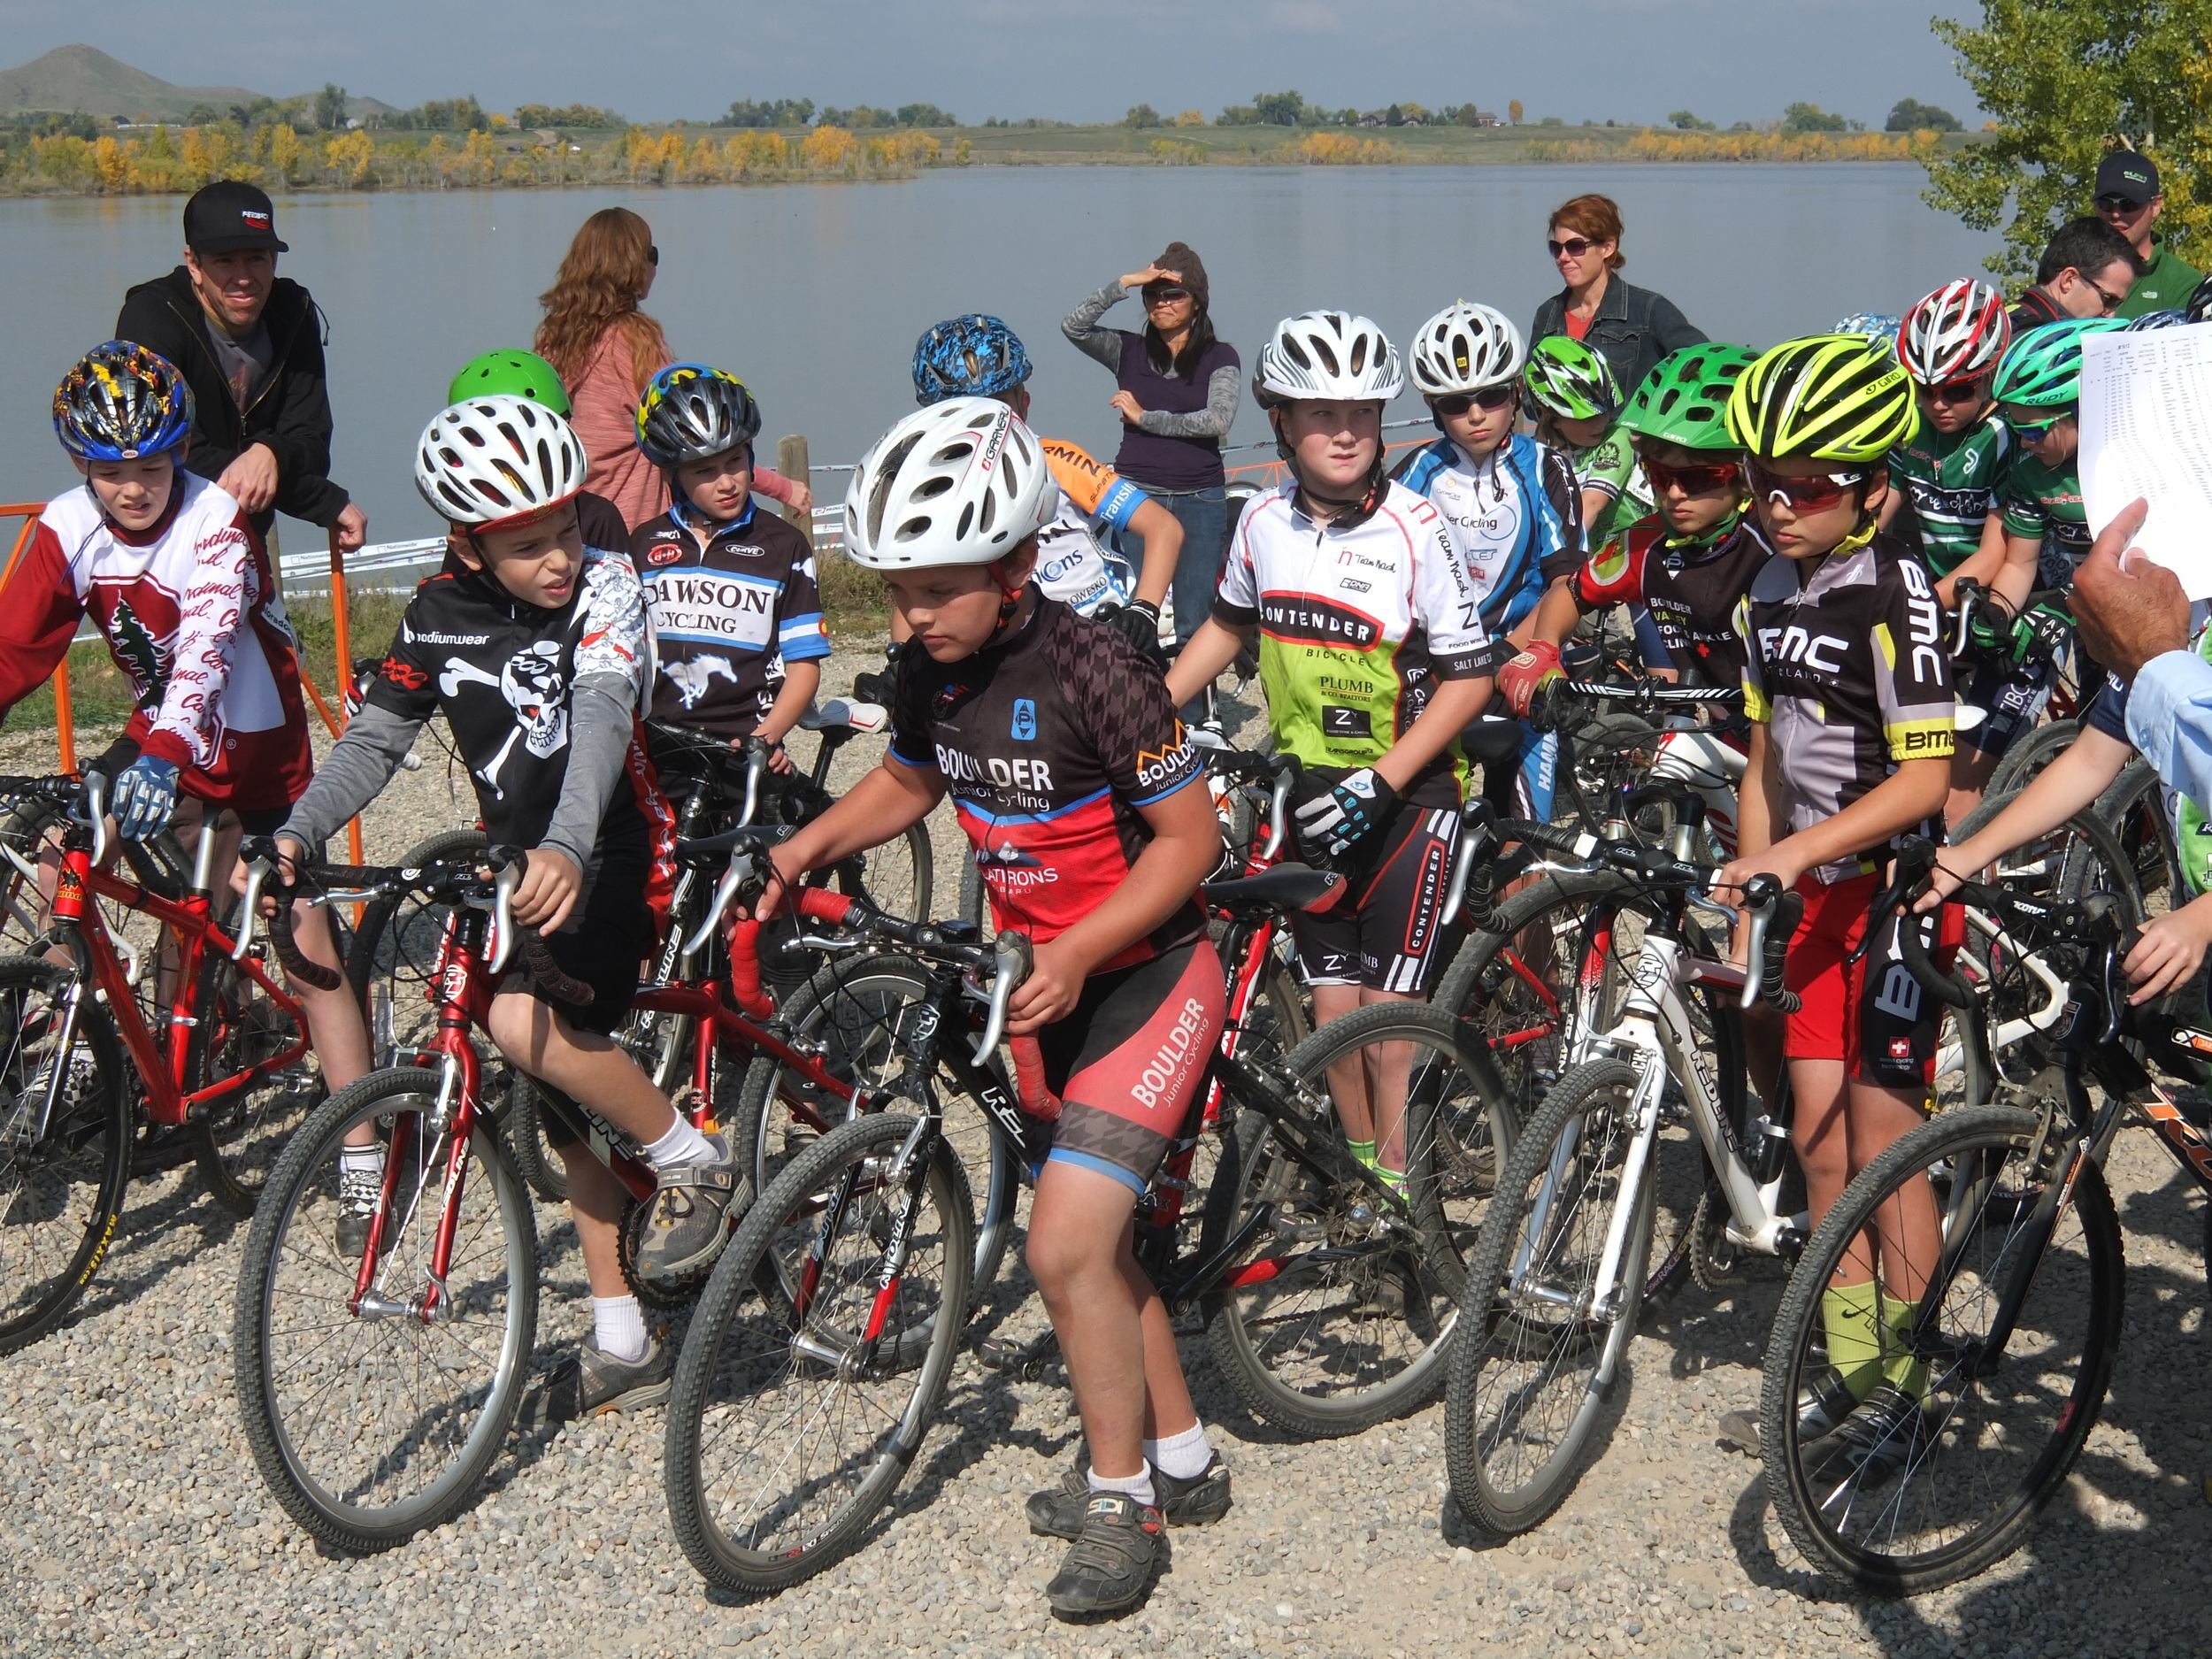 cyclecross race nick start (4).JPG